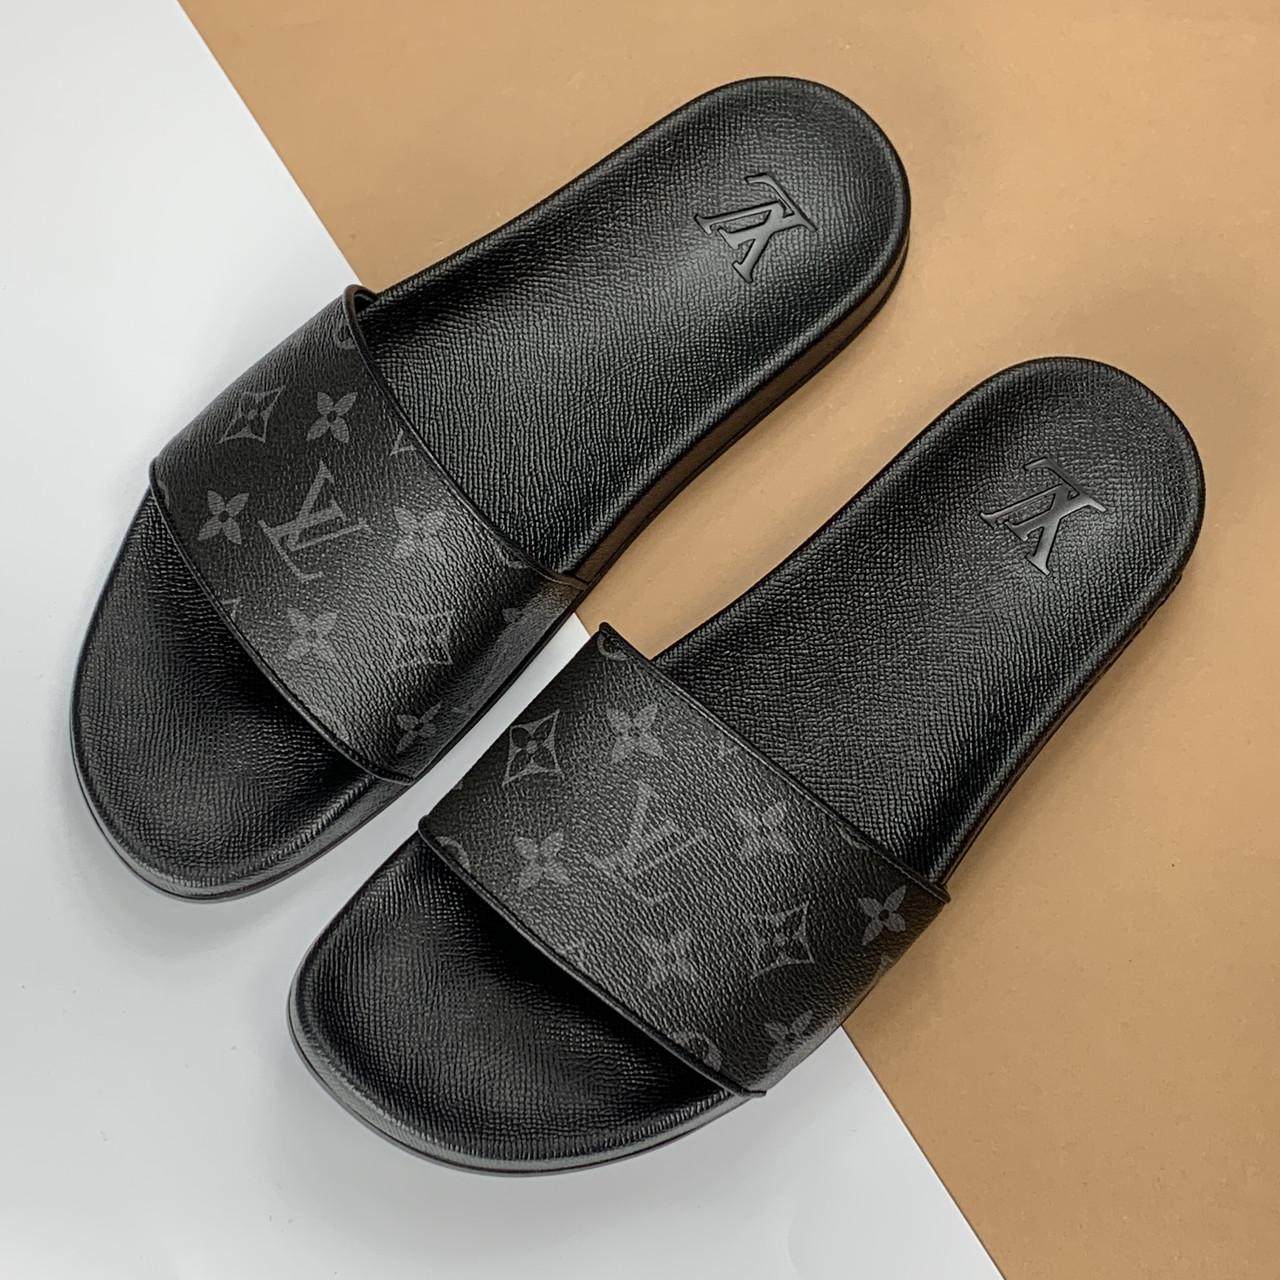 Мужские шлепанцы Louis Vuitton